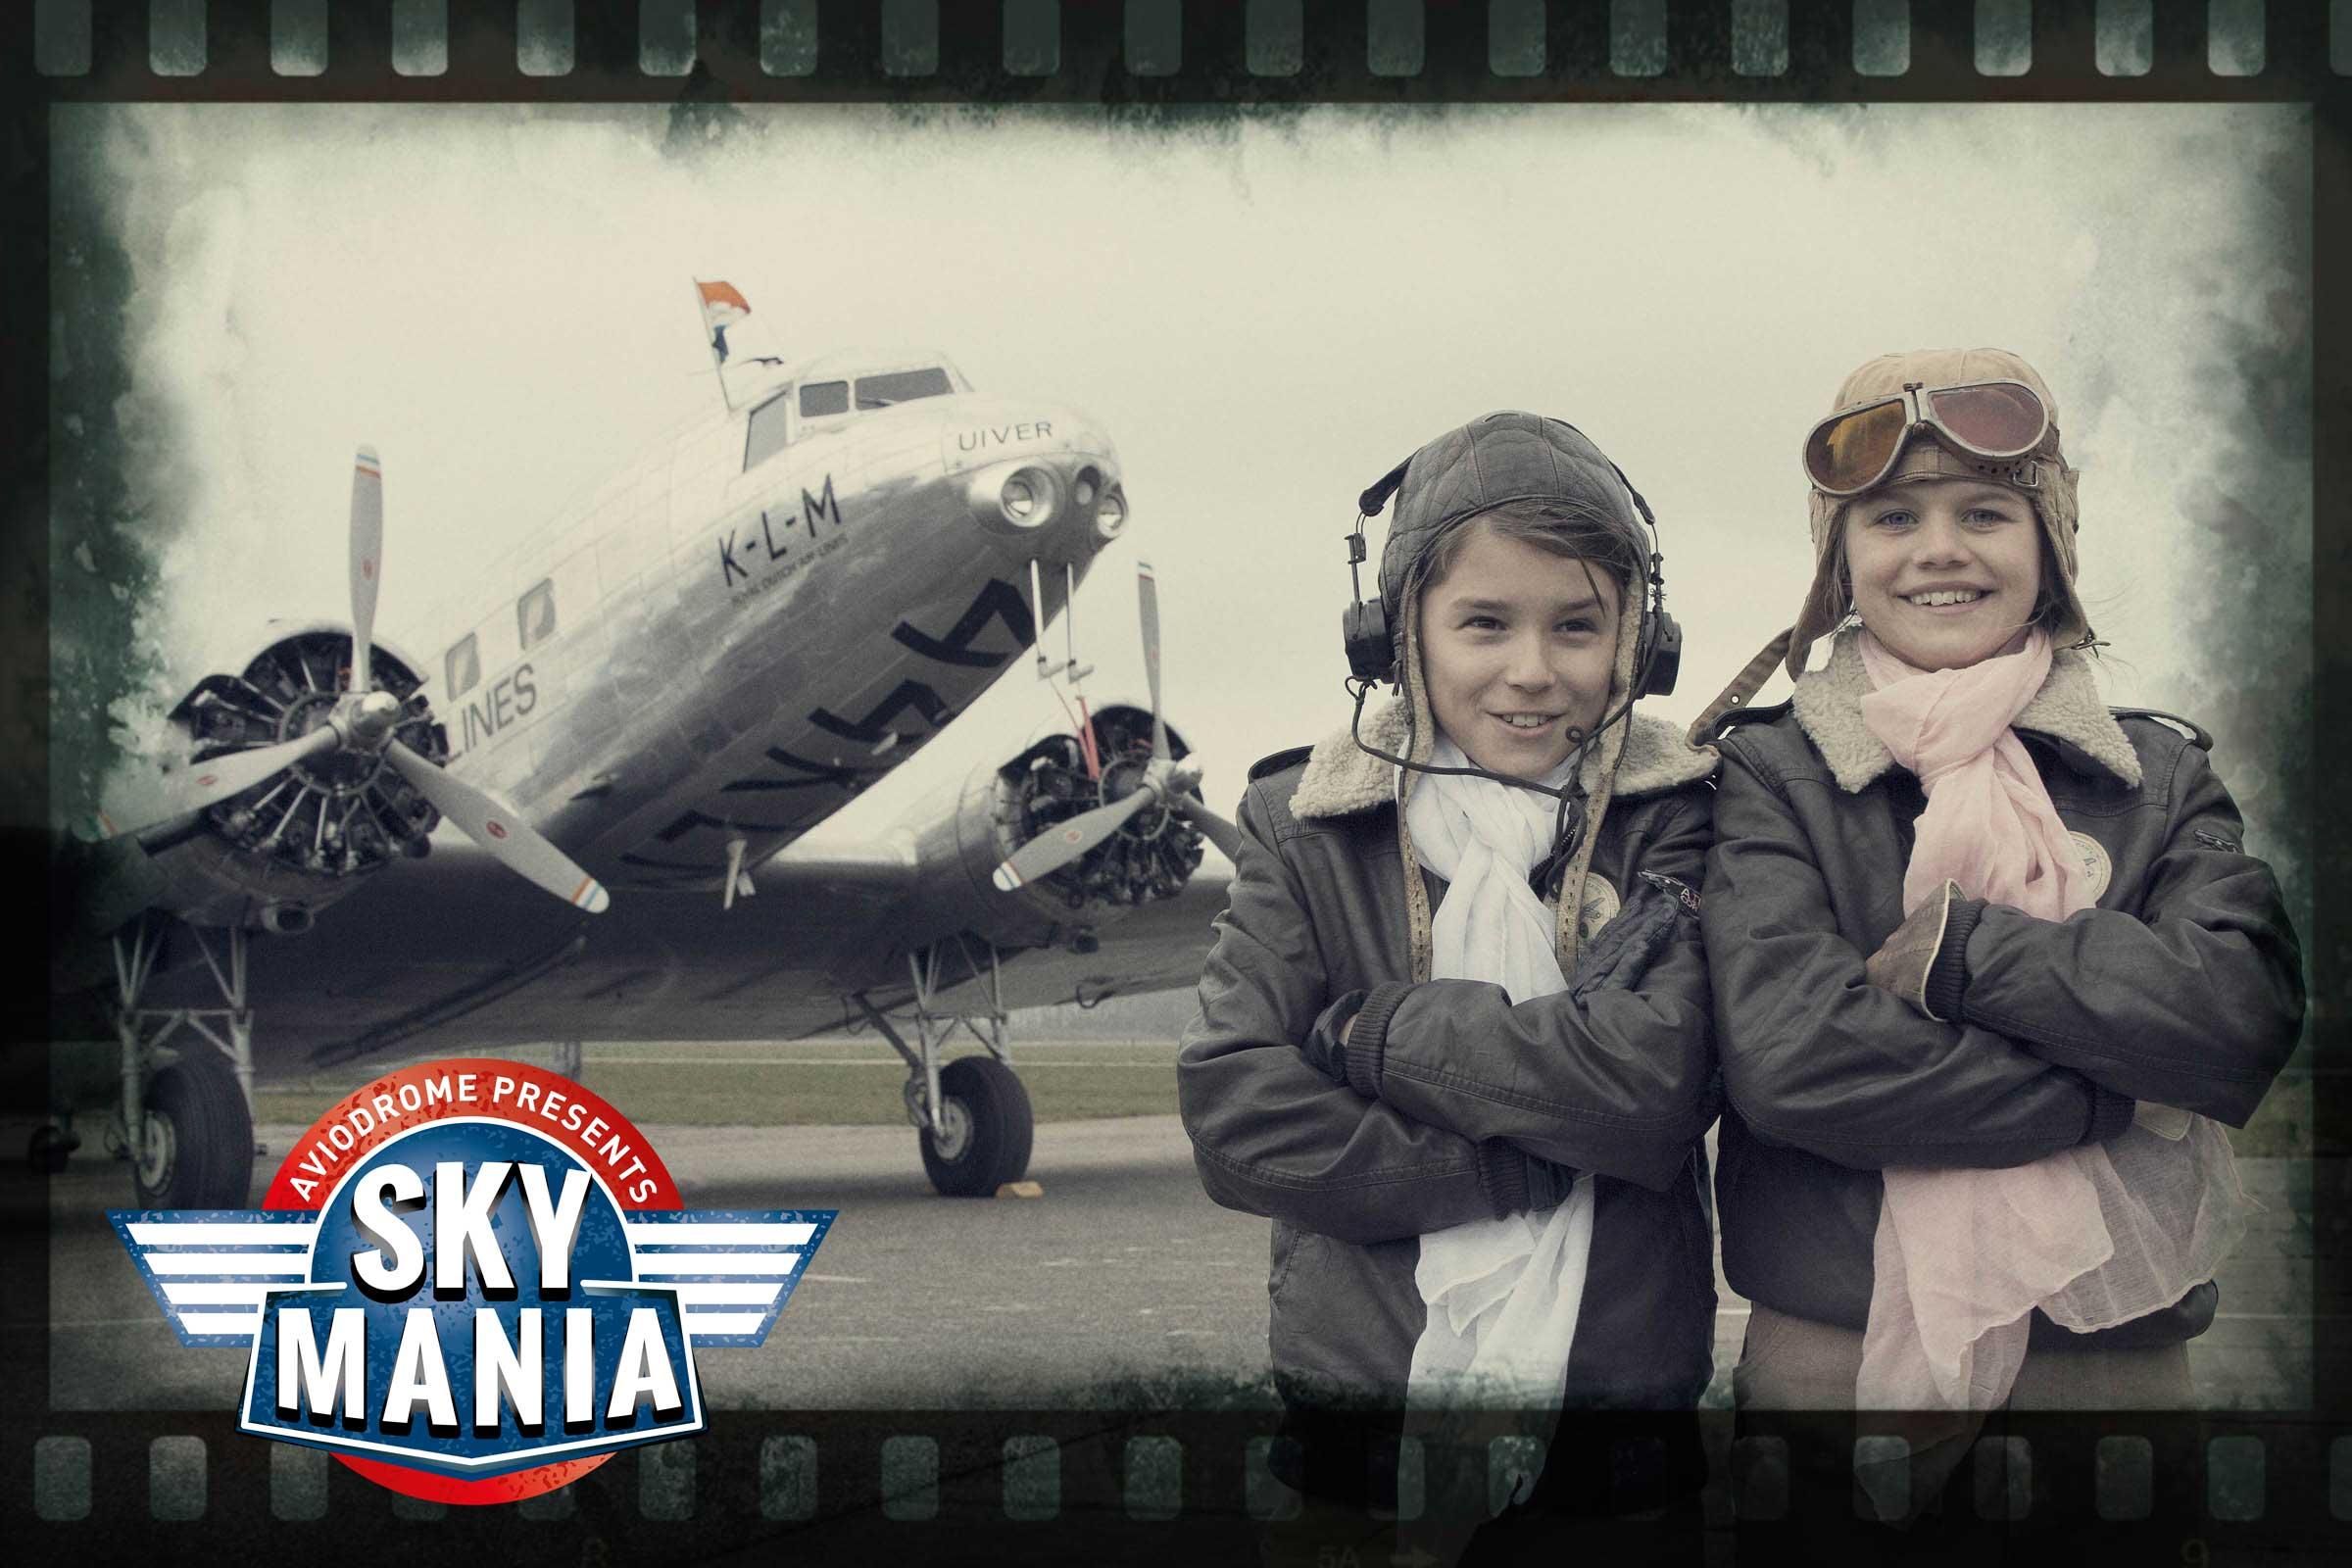 Skymania nu te zien bij Aviodrome